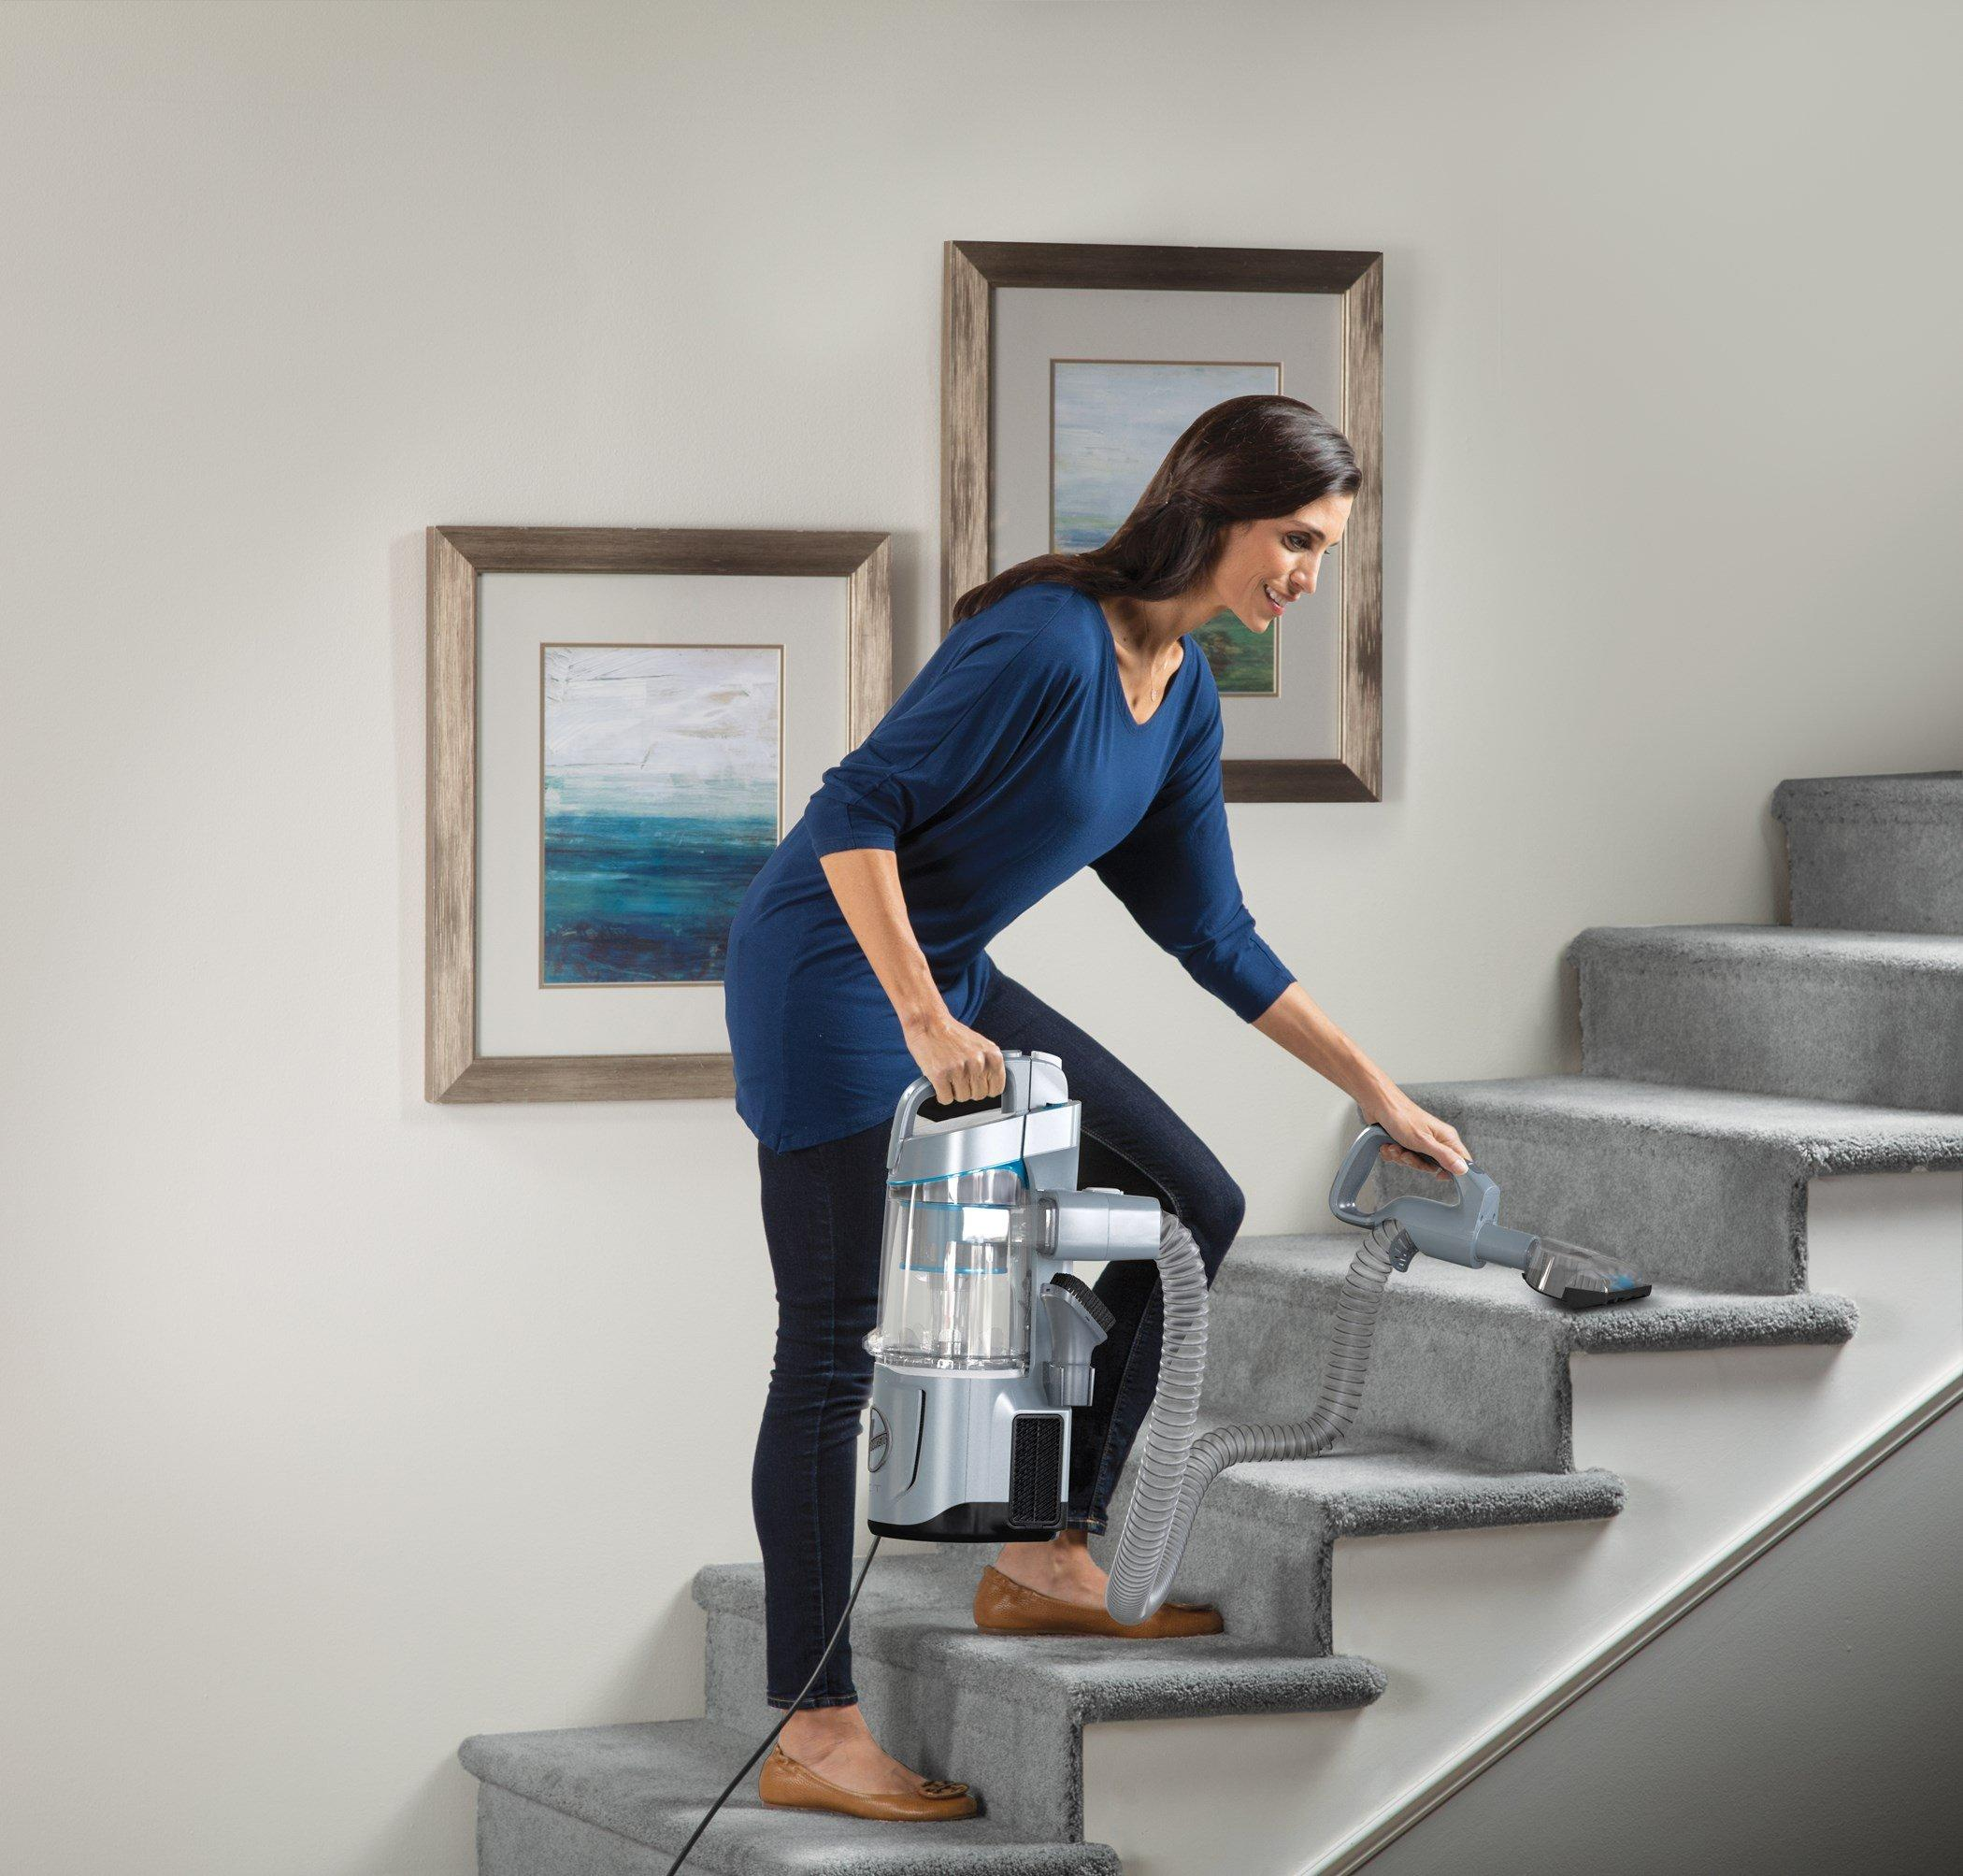 REACT QuickLift Deluxe Upright Vacuum2